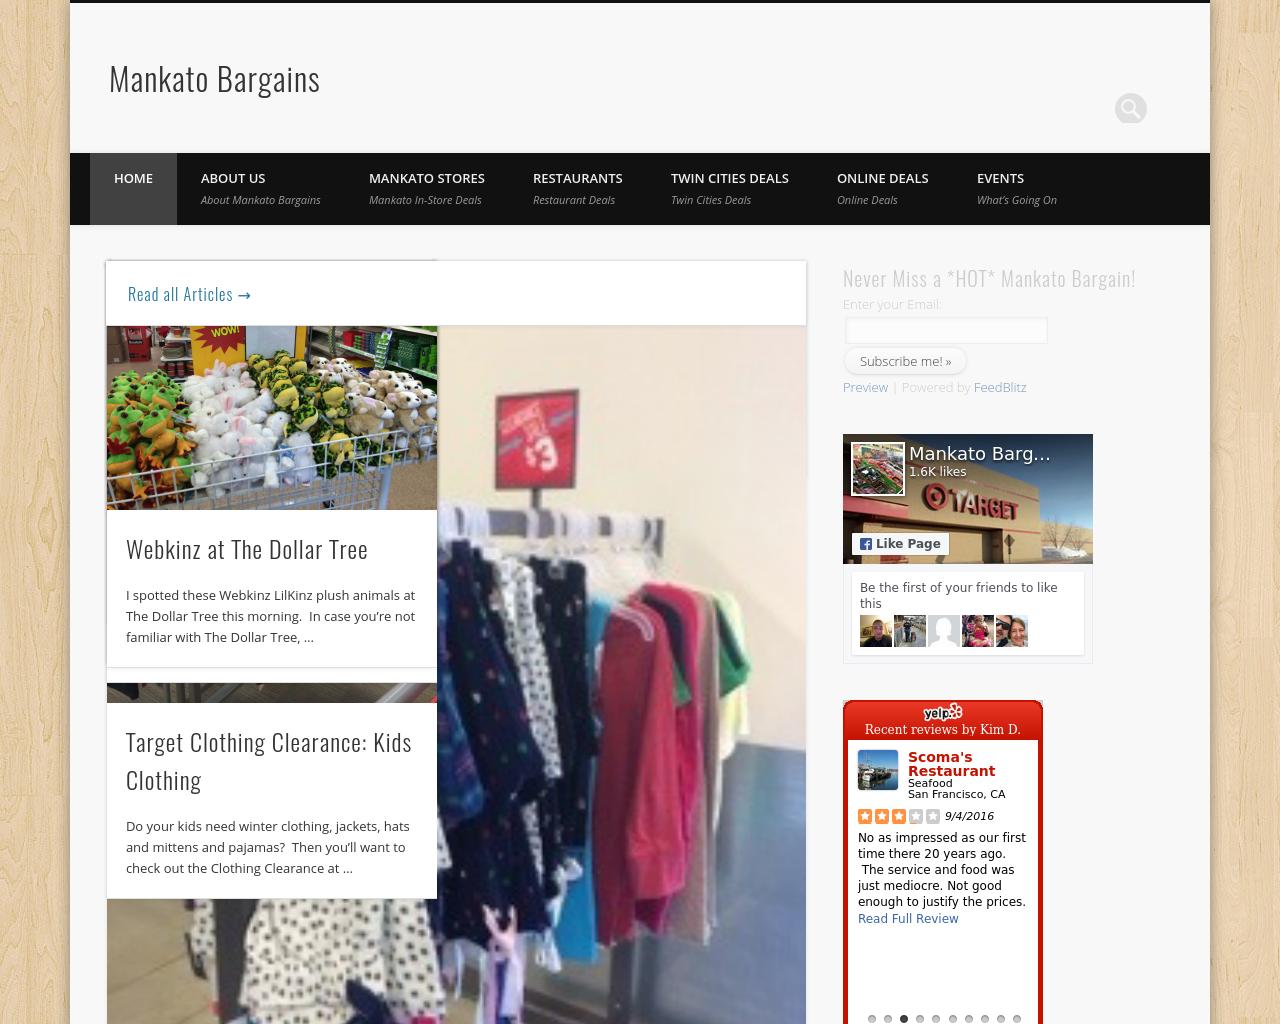 Mankato-Bargains-Advertising-Reviews-Pricing